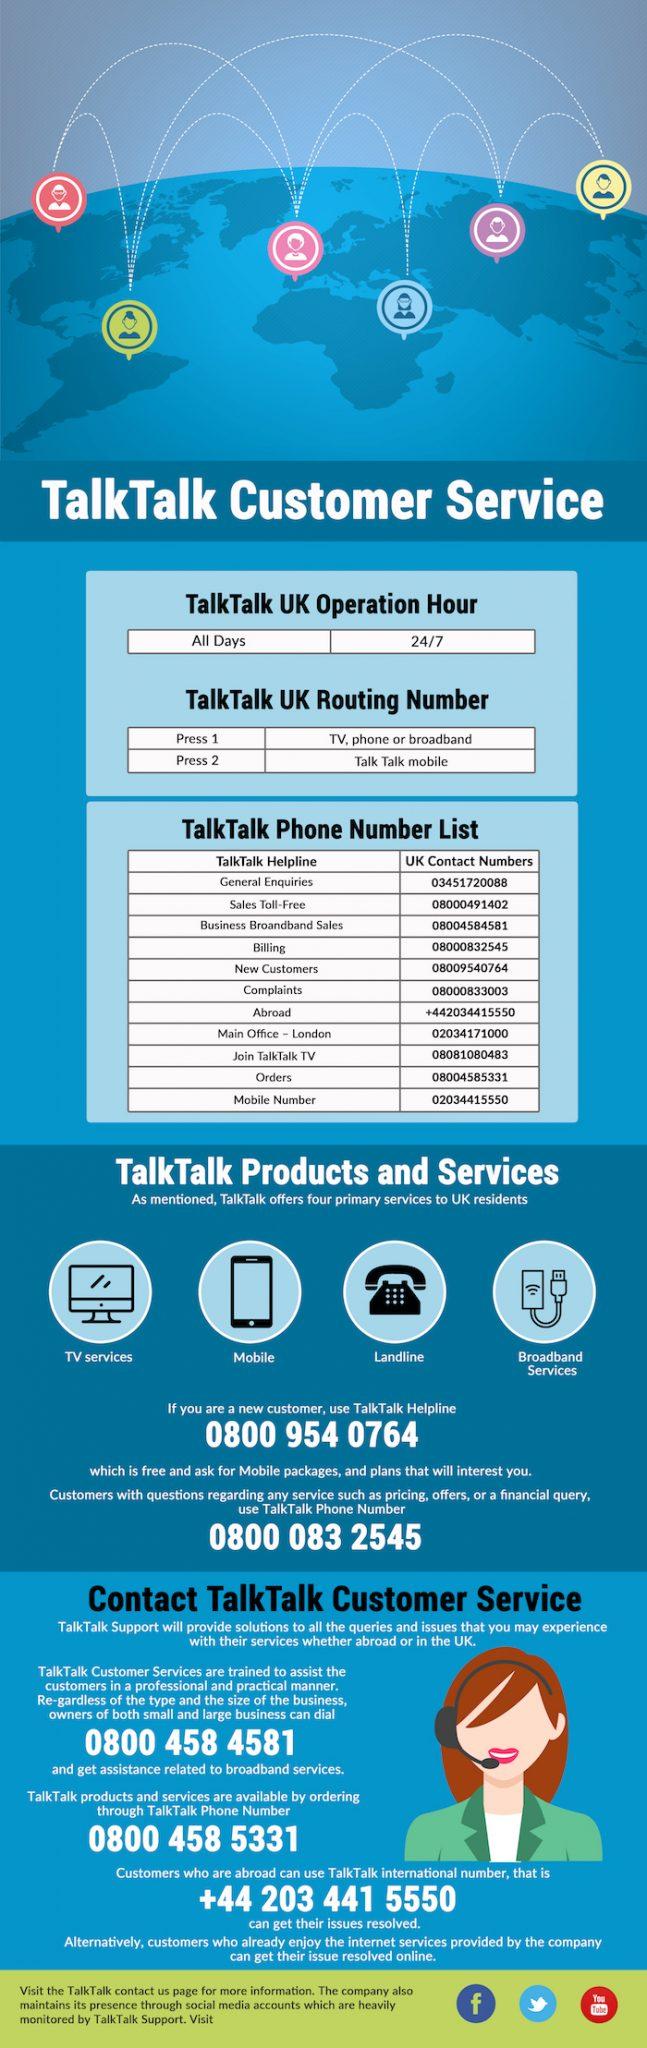 TalkTalk Customer Service Number New  Call on 0844 306 9108